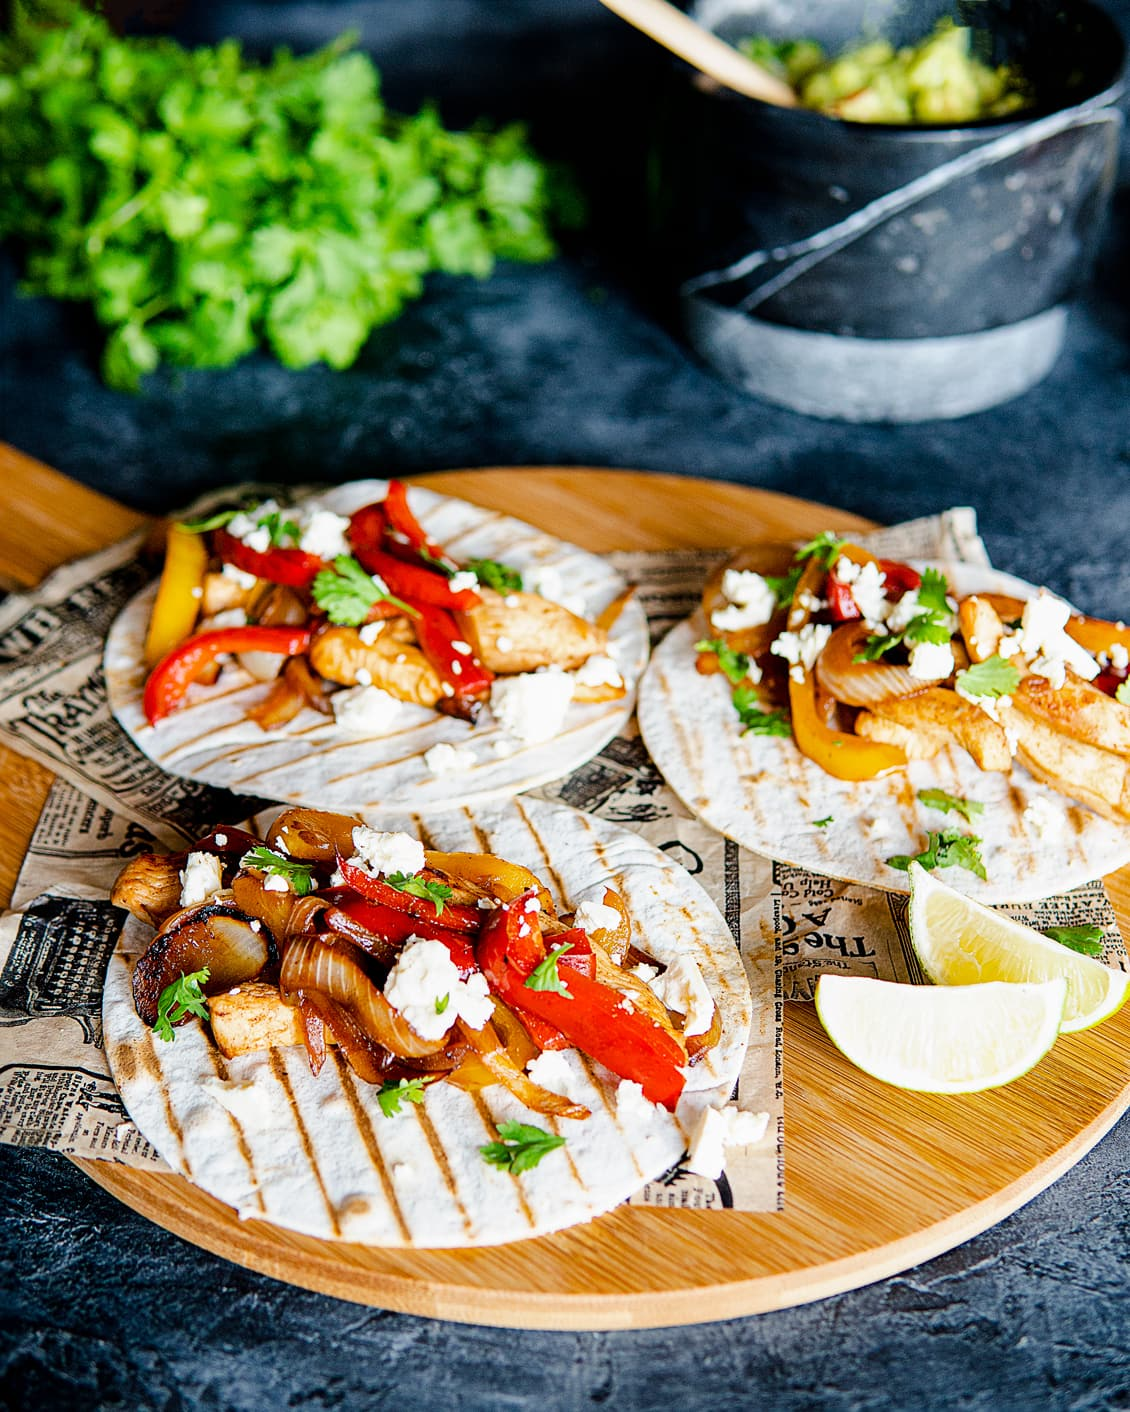 fotografo gastronomico canarias